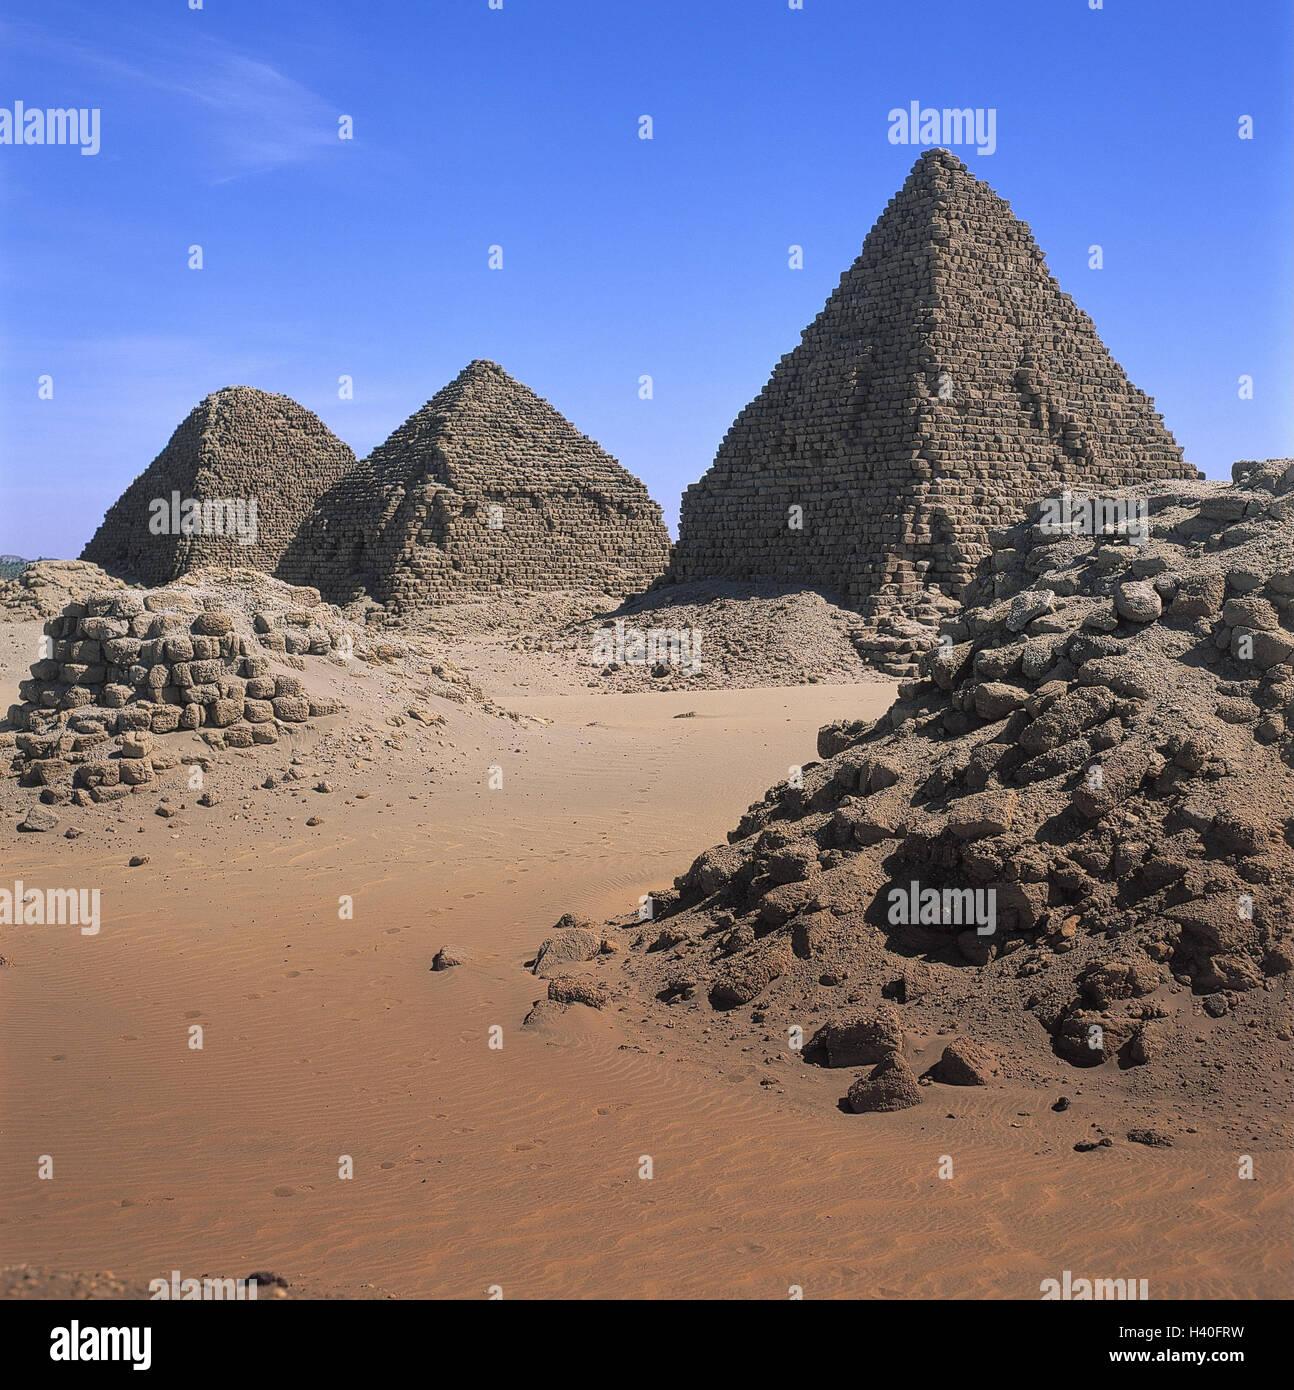 Sudan, Nuri, necropolis, Napatan kings, pyramids, Africa, temple, ruin, architecture, archeology, culture, place Stock Photo